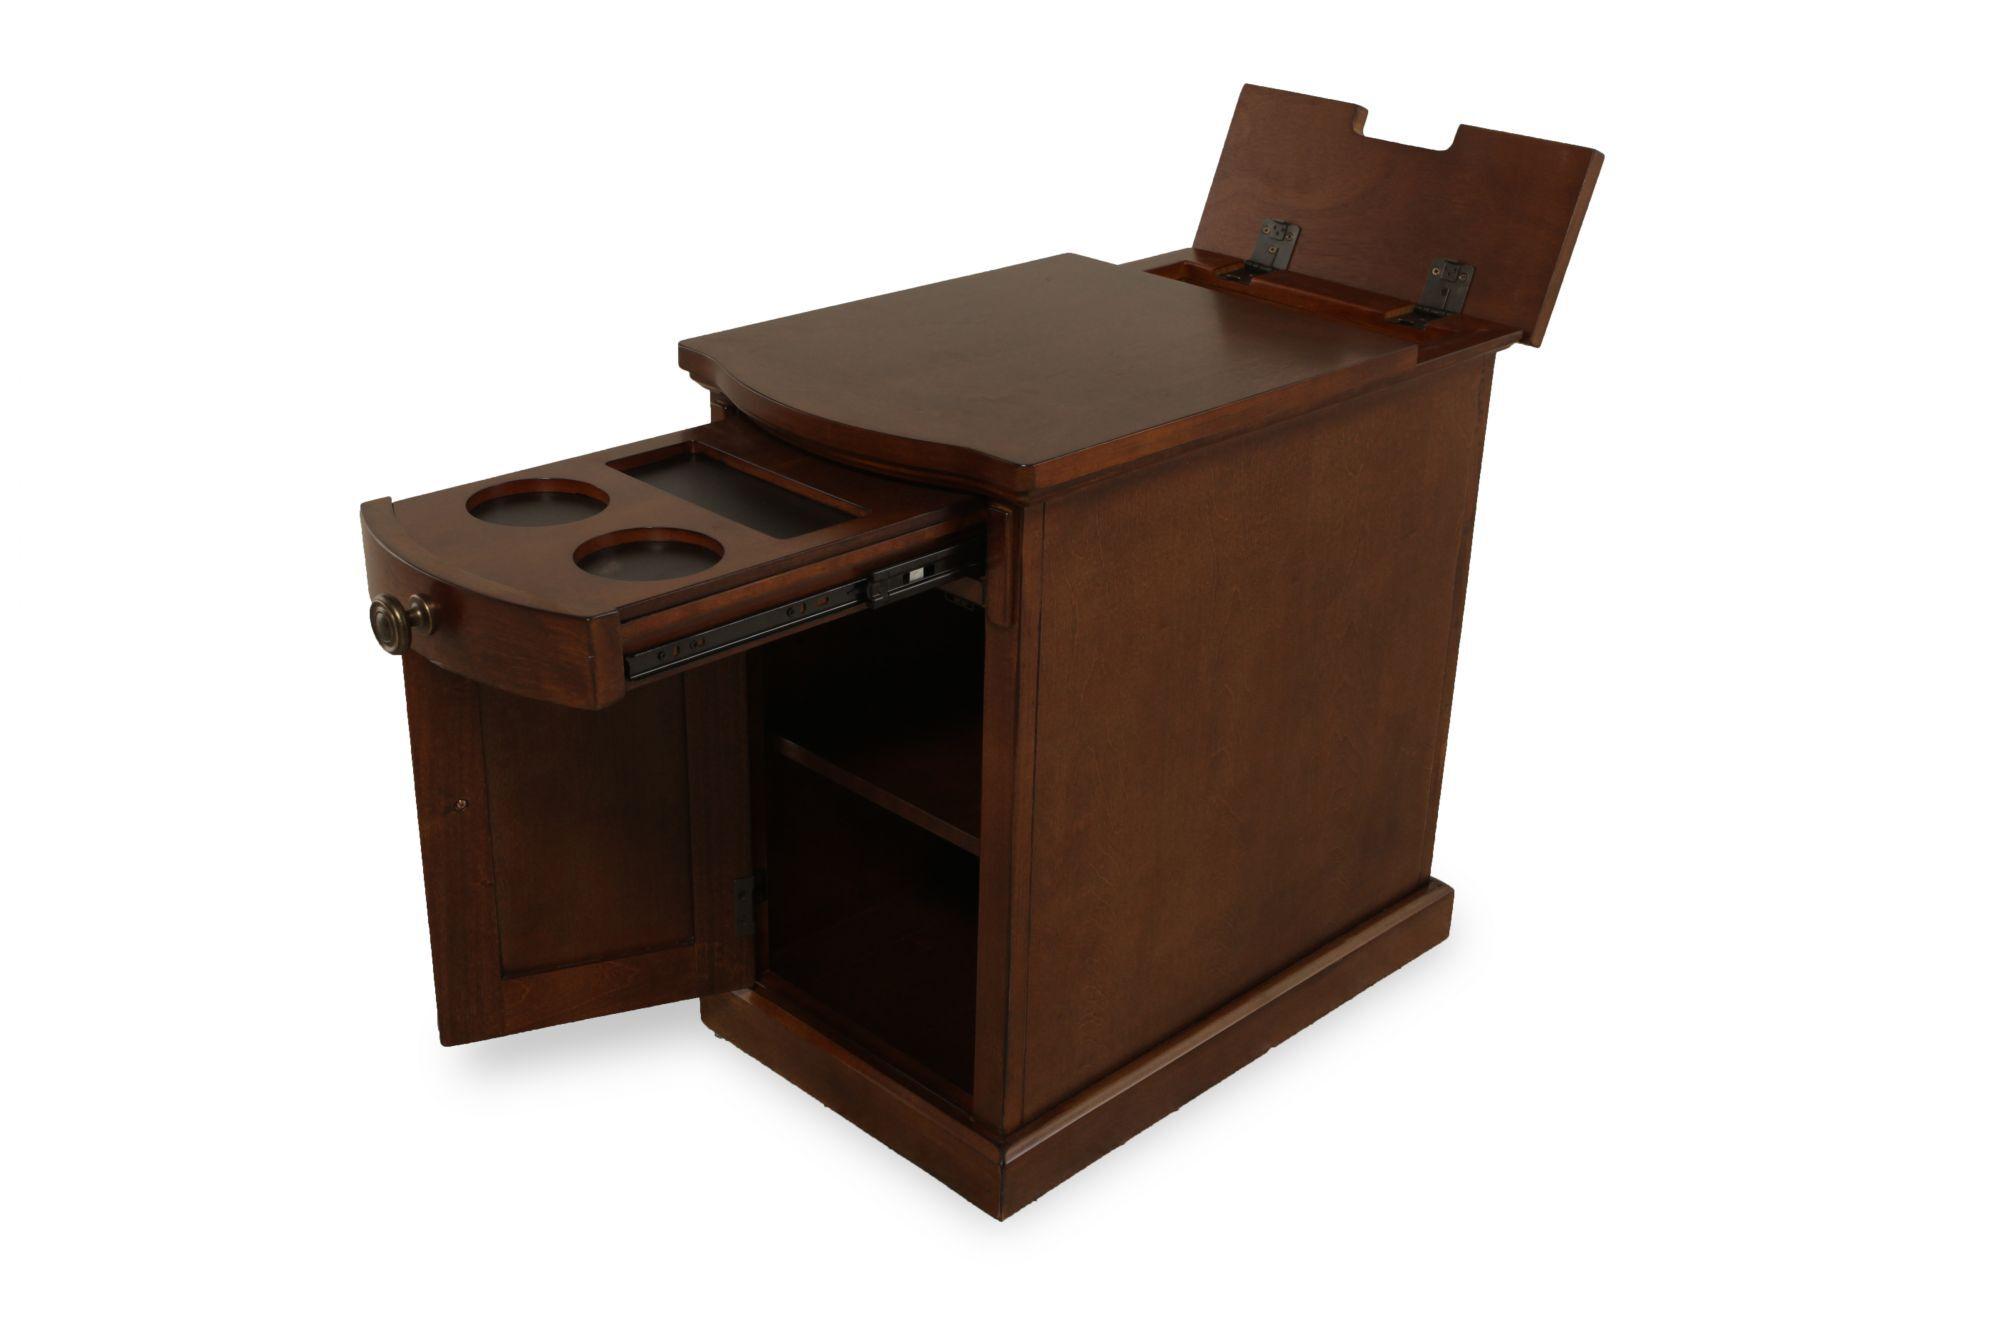 Rectangular Contemporary Chairside Table In Dark Cherry